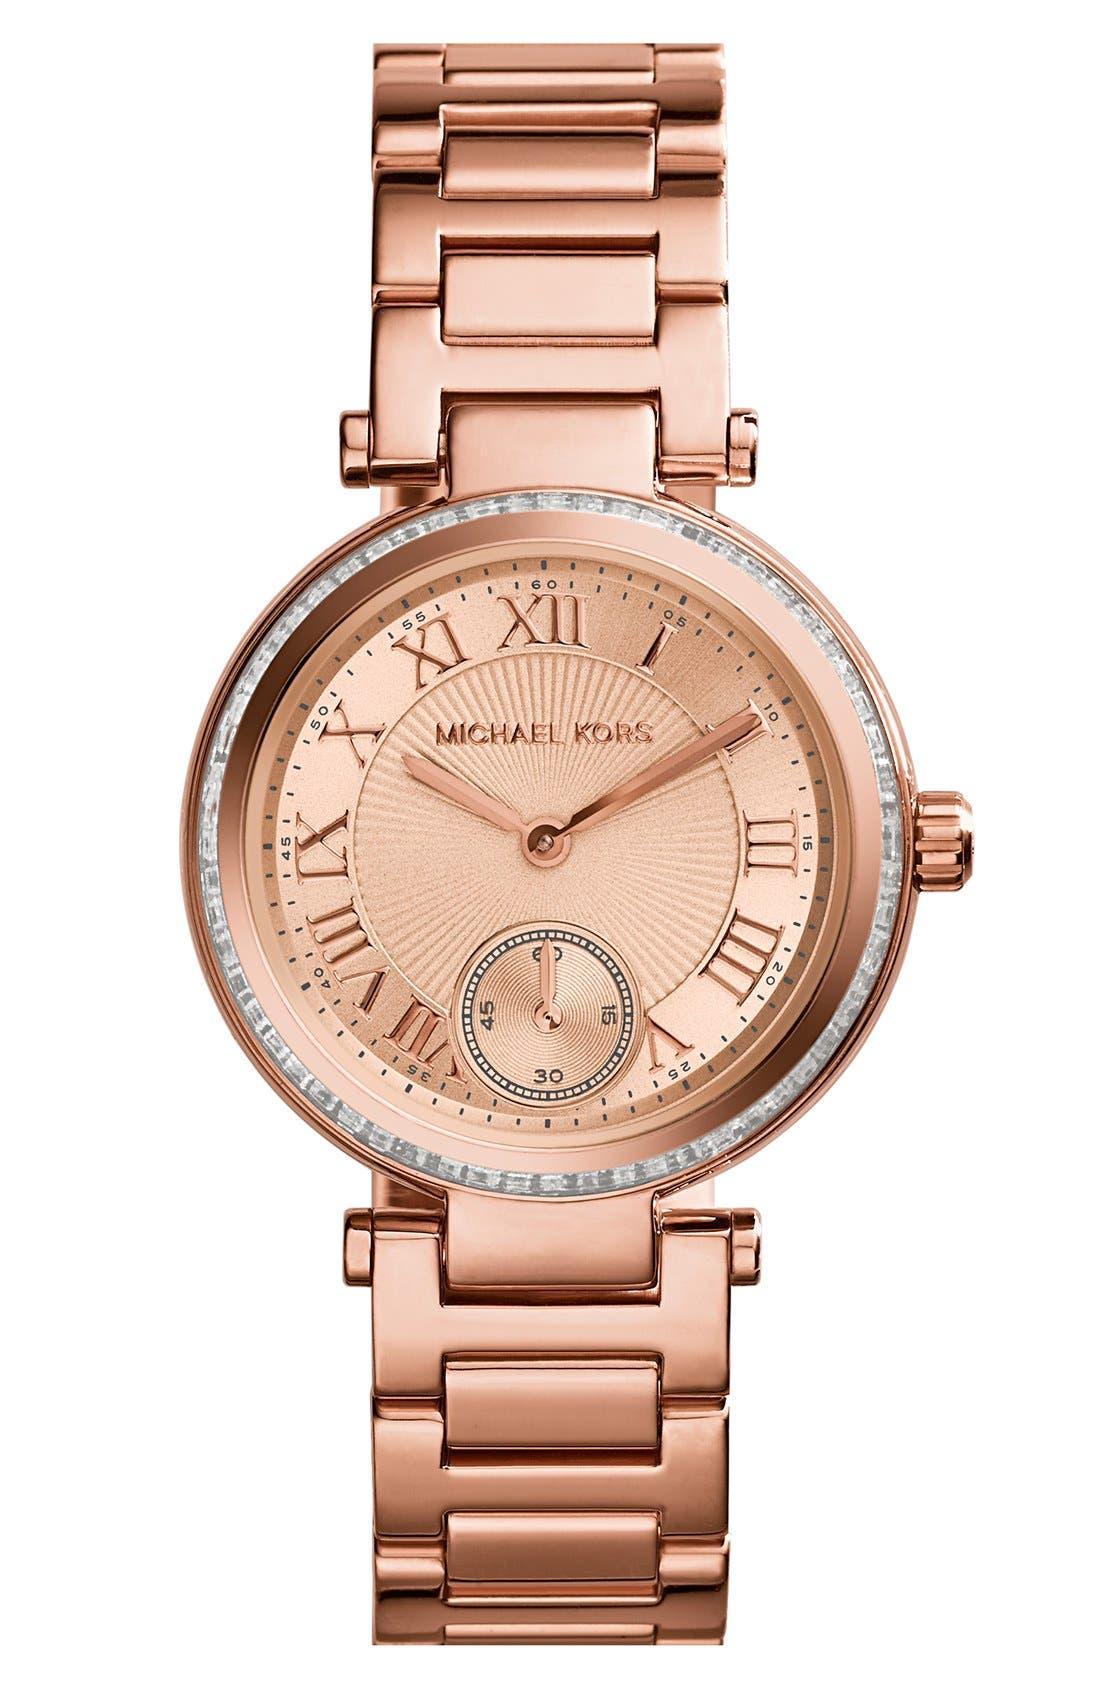 Main Image - Michael Kors 'Skylar - Small' Crystal Bezel Bracelet Watch, 33mm